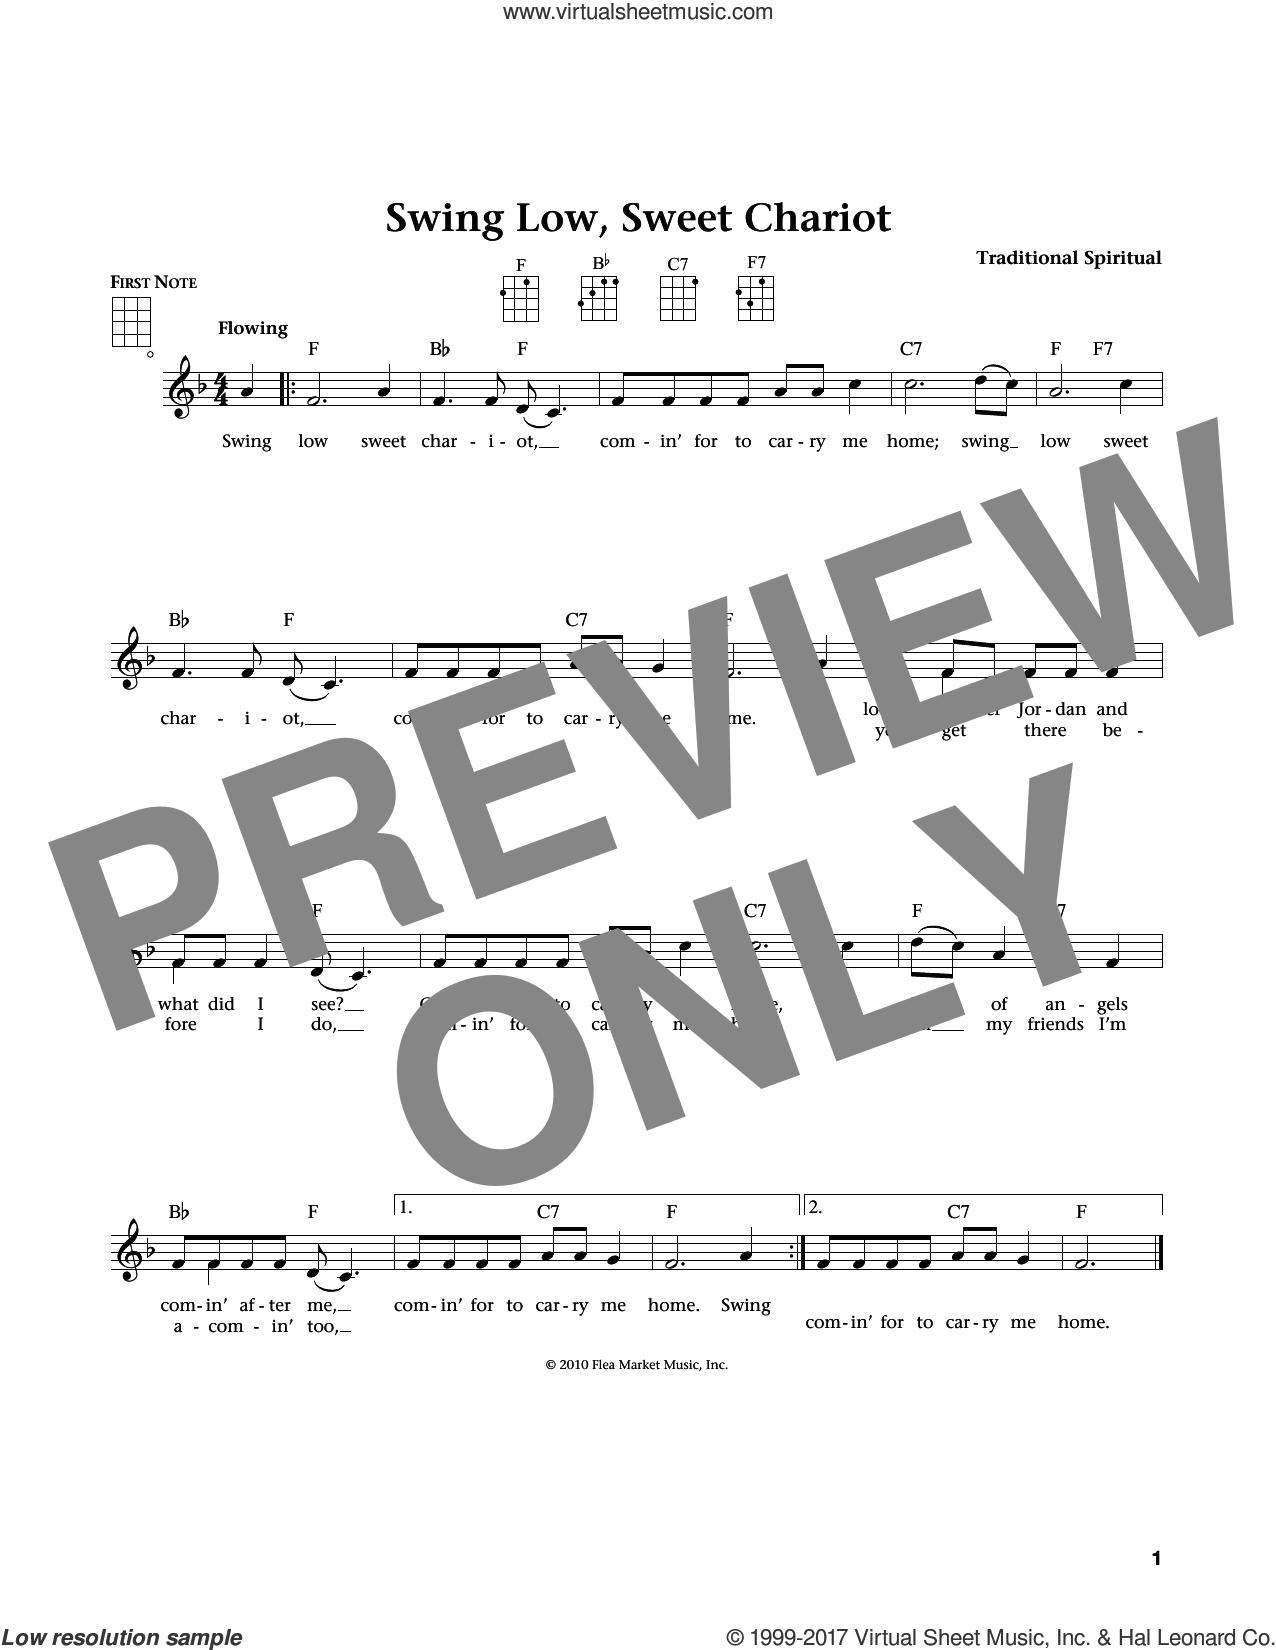 Swing Low, Sweet Chariot (from The Daily Ukulele) (arr. Liz and Jim Beloff) sheet music for ukulele , Jim Beloff and Liz Beloff, intermediate skill level